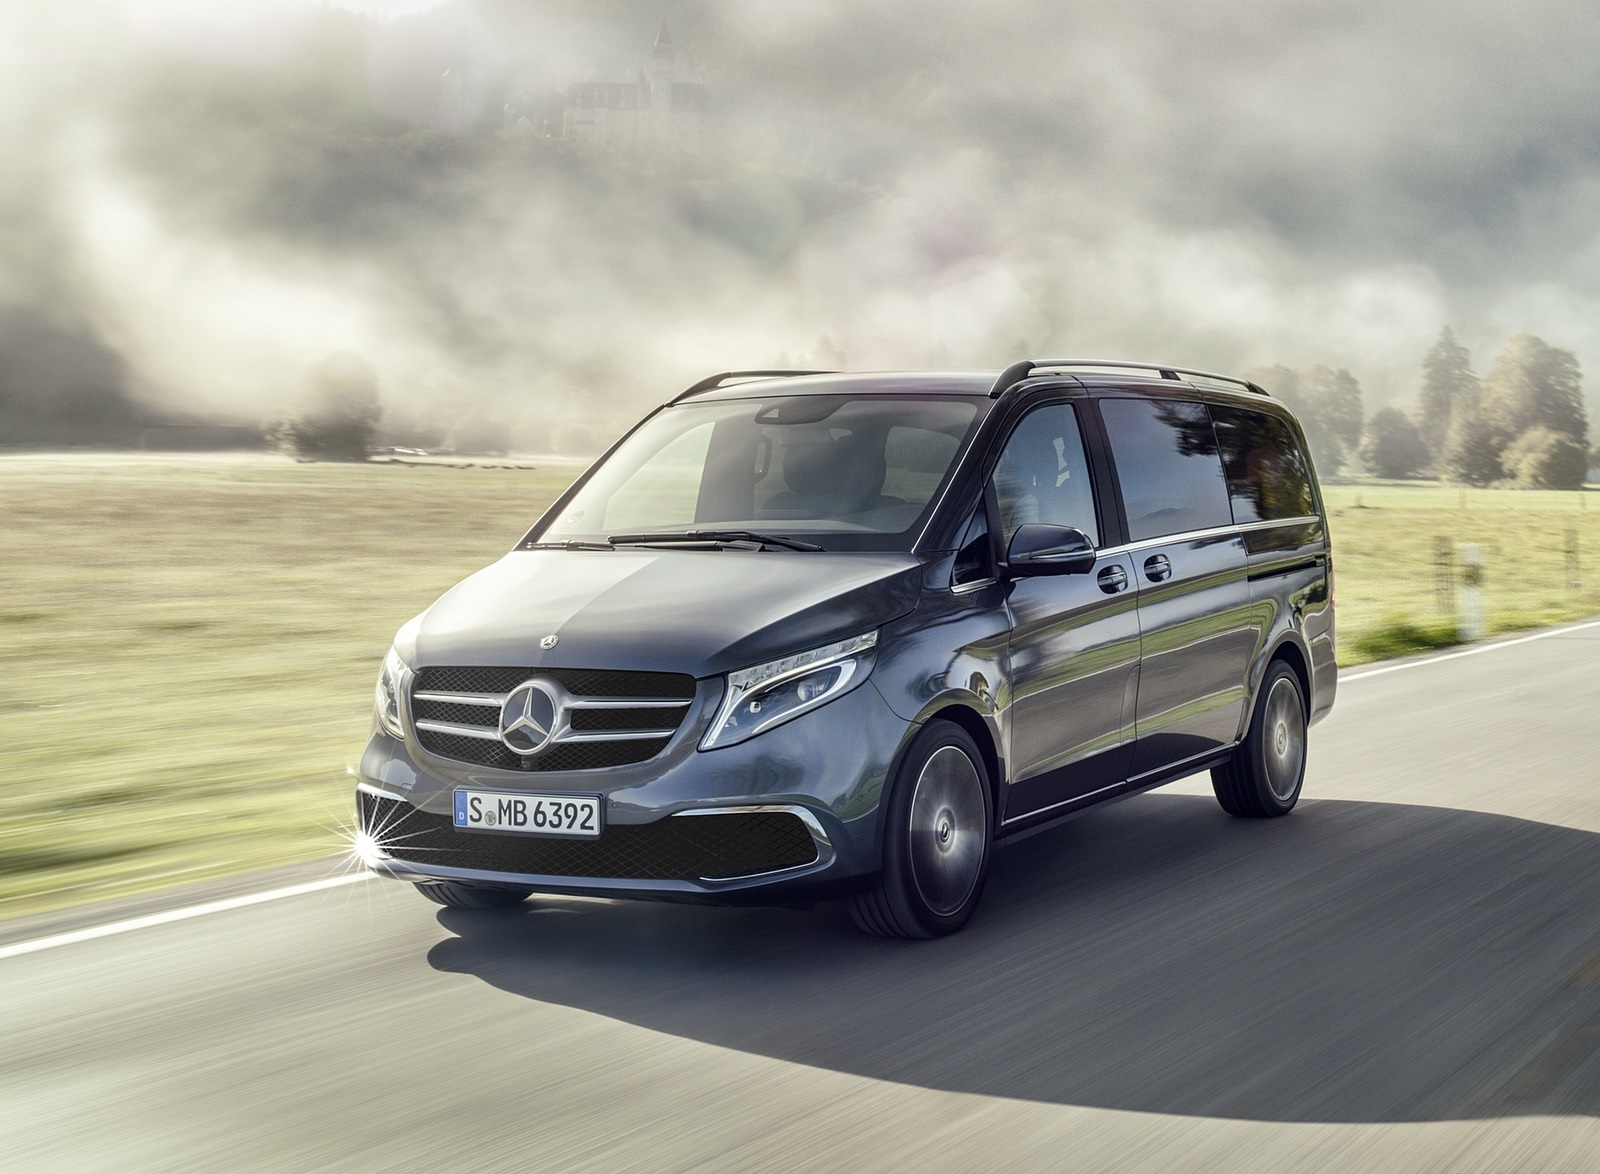 2019 Mercedes-Benz V-Class EXCLUSIVE Line (Color: Selenit Grey Metallic) Front Three-Quarter Wallpapers (8)